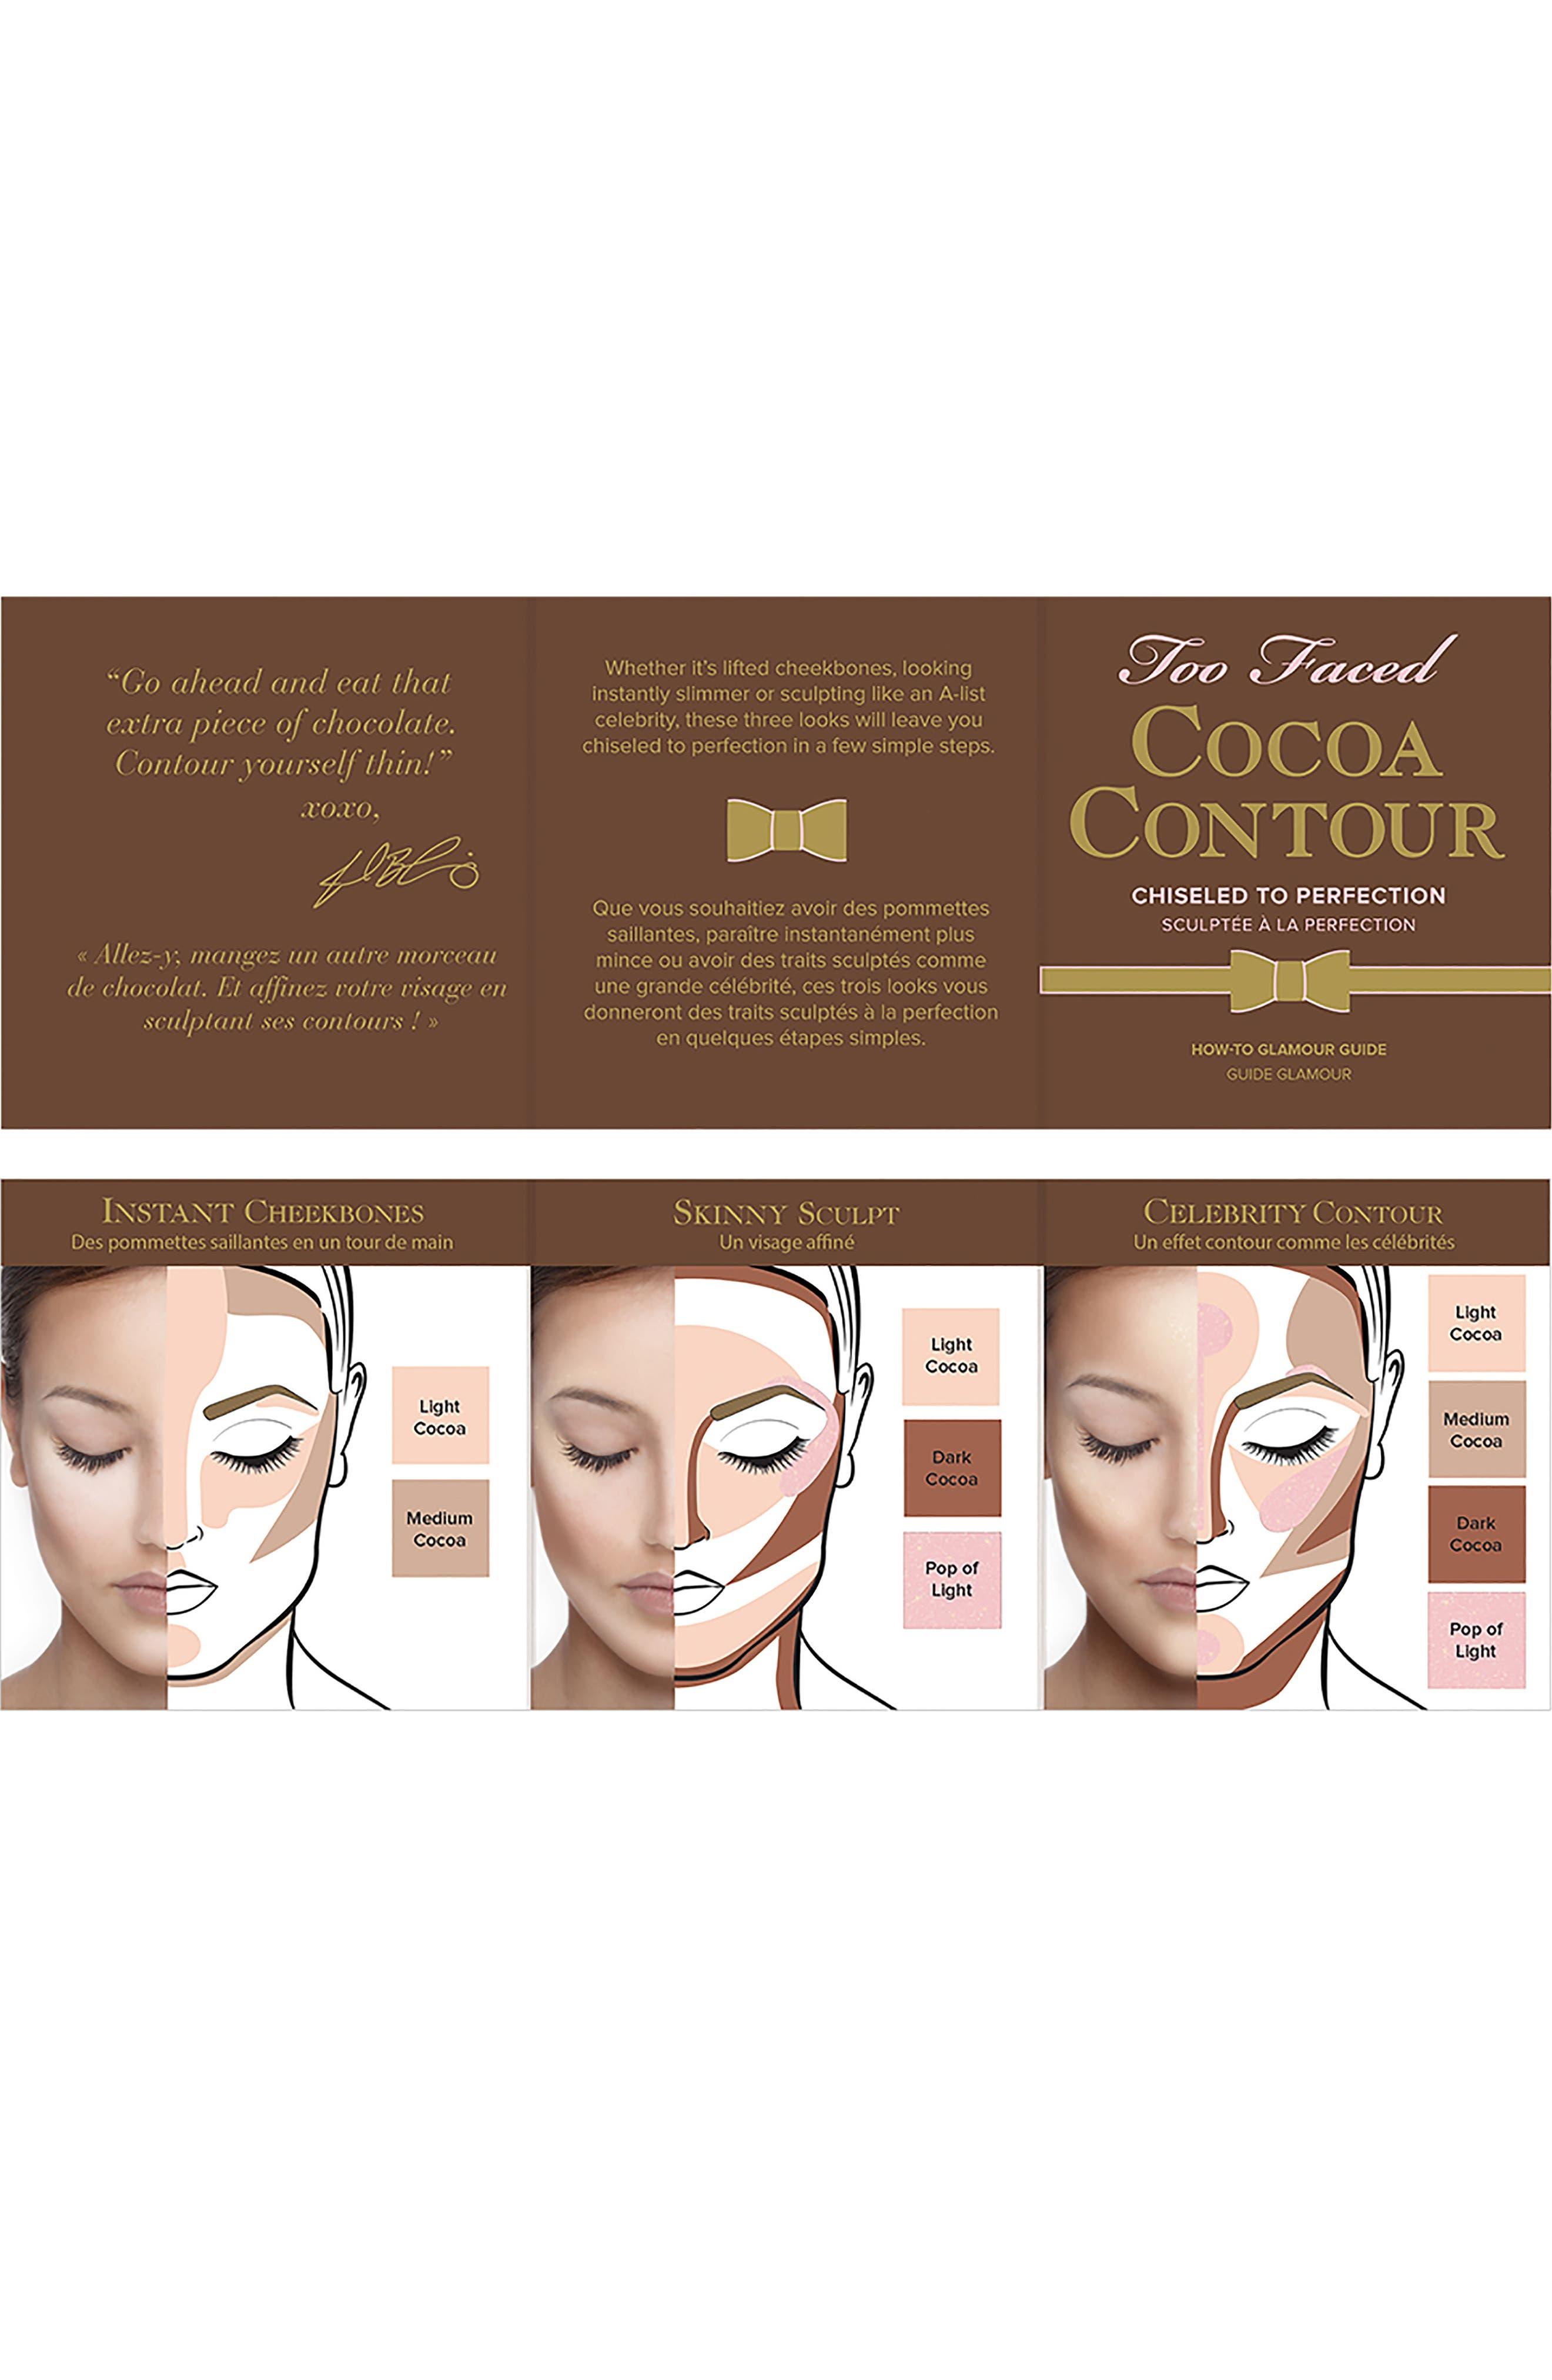 Cocoa Contour Chiseled To Perfection Palette,                             Alternate thumbnail 2, color,                             No Color